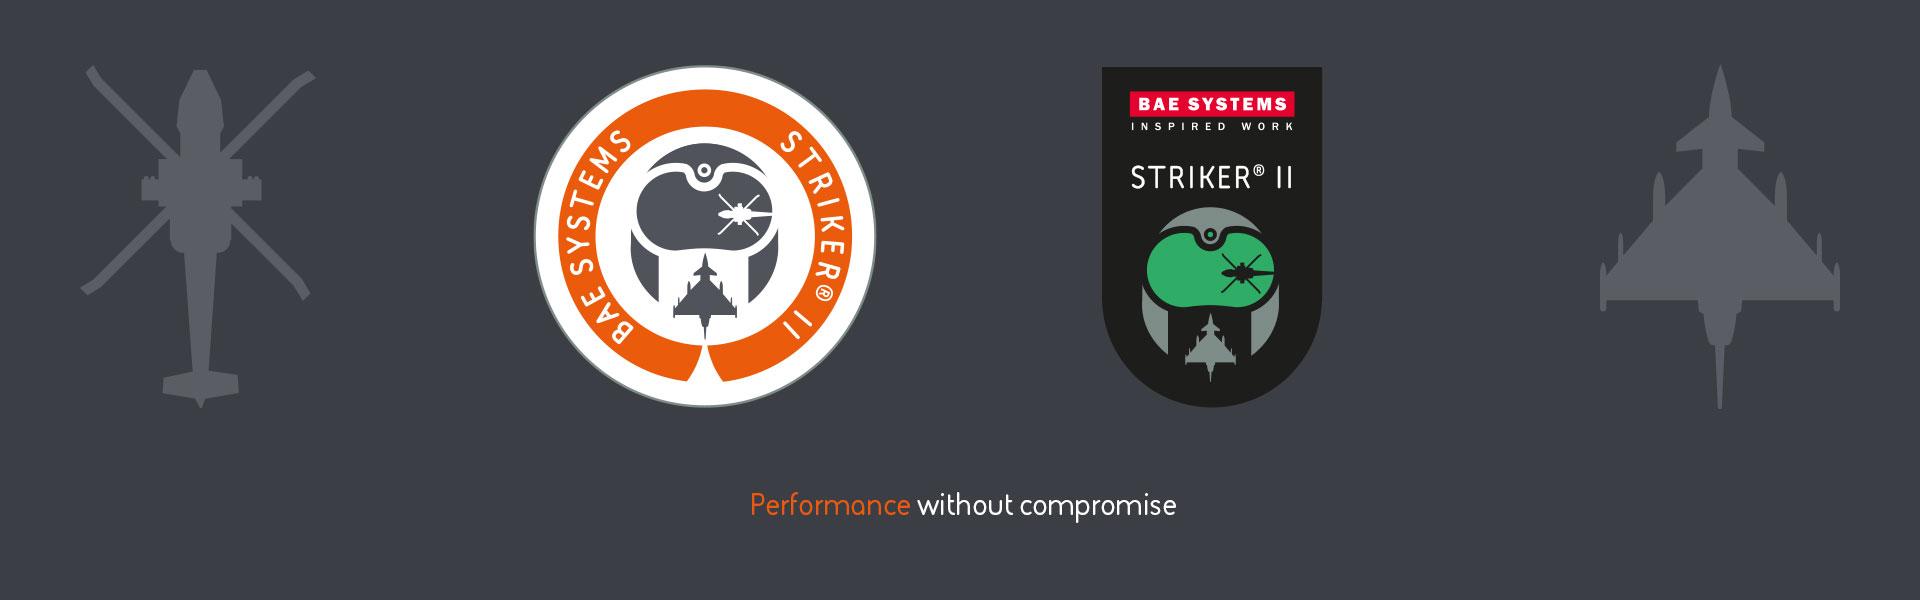 Glendale Creative BAE Striker Pack Patch Design